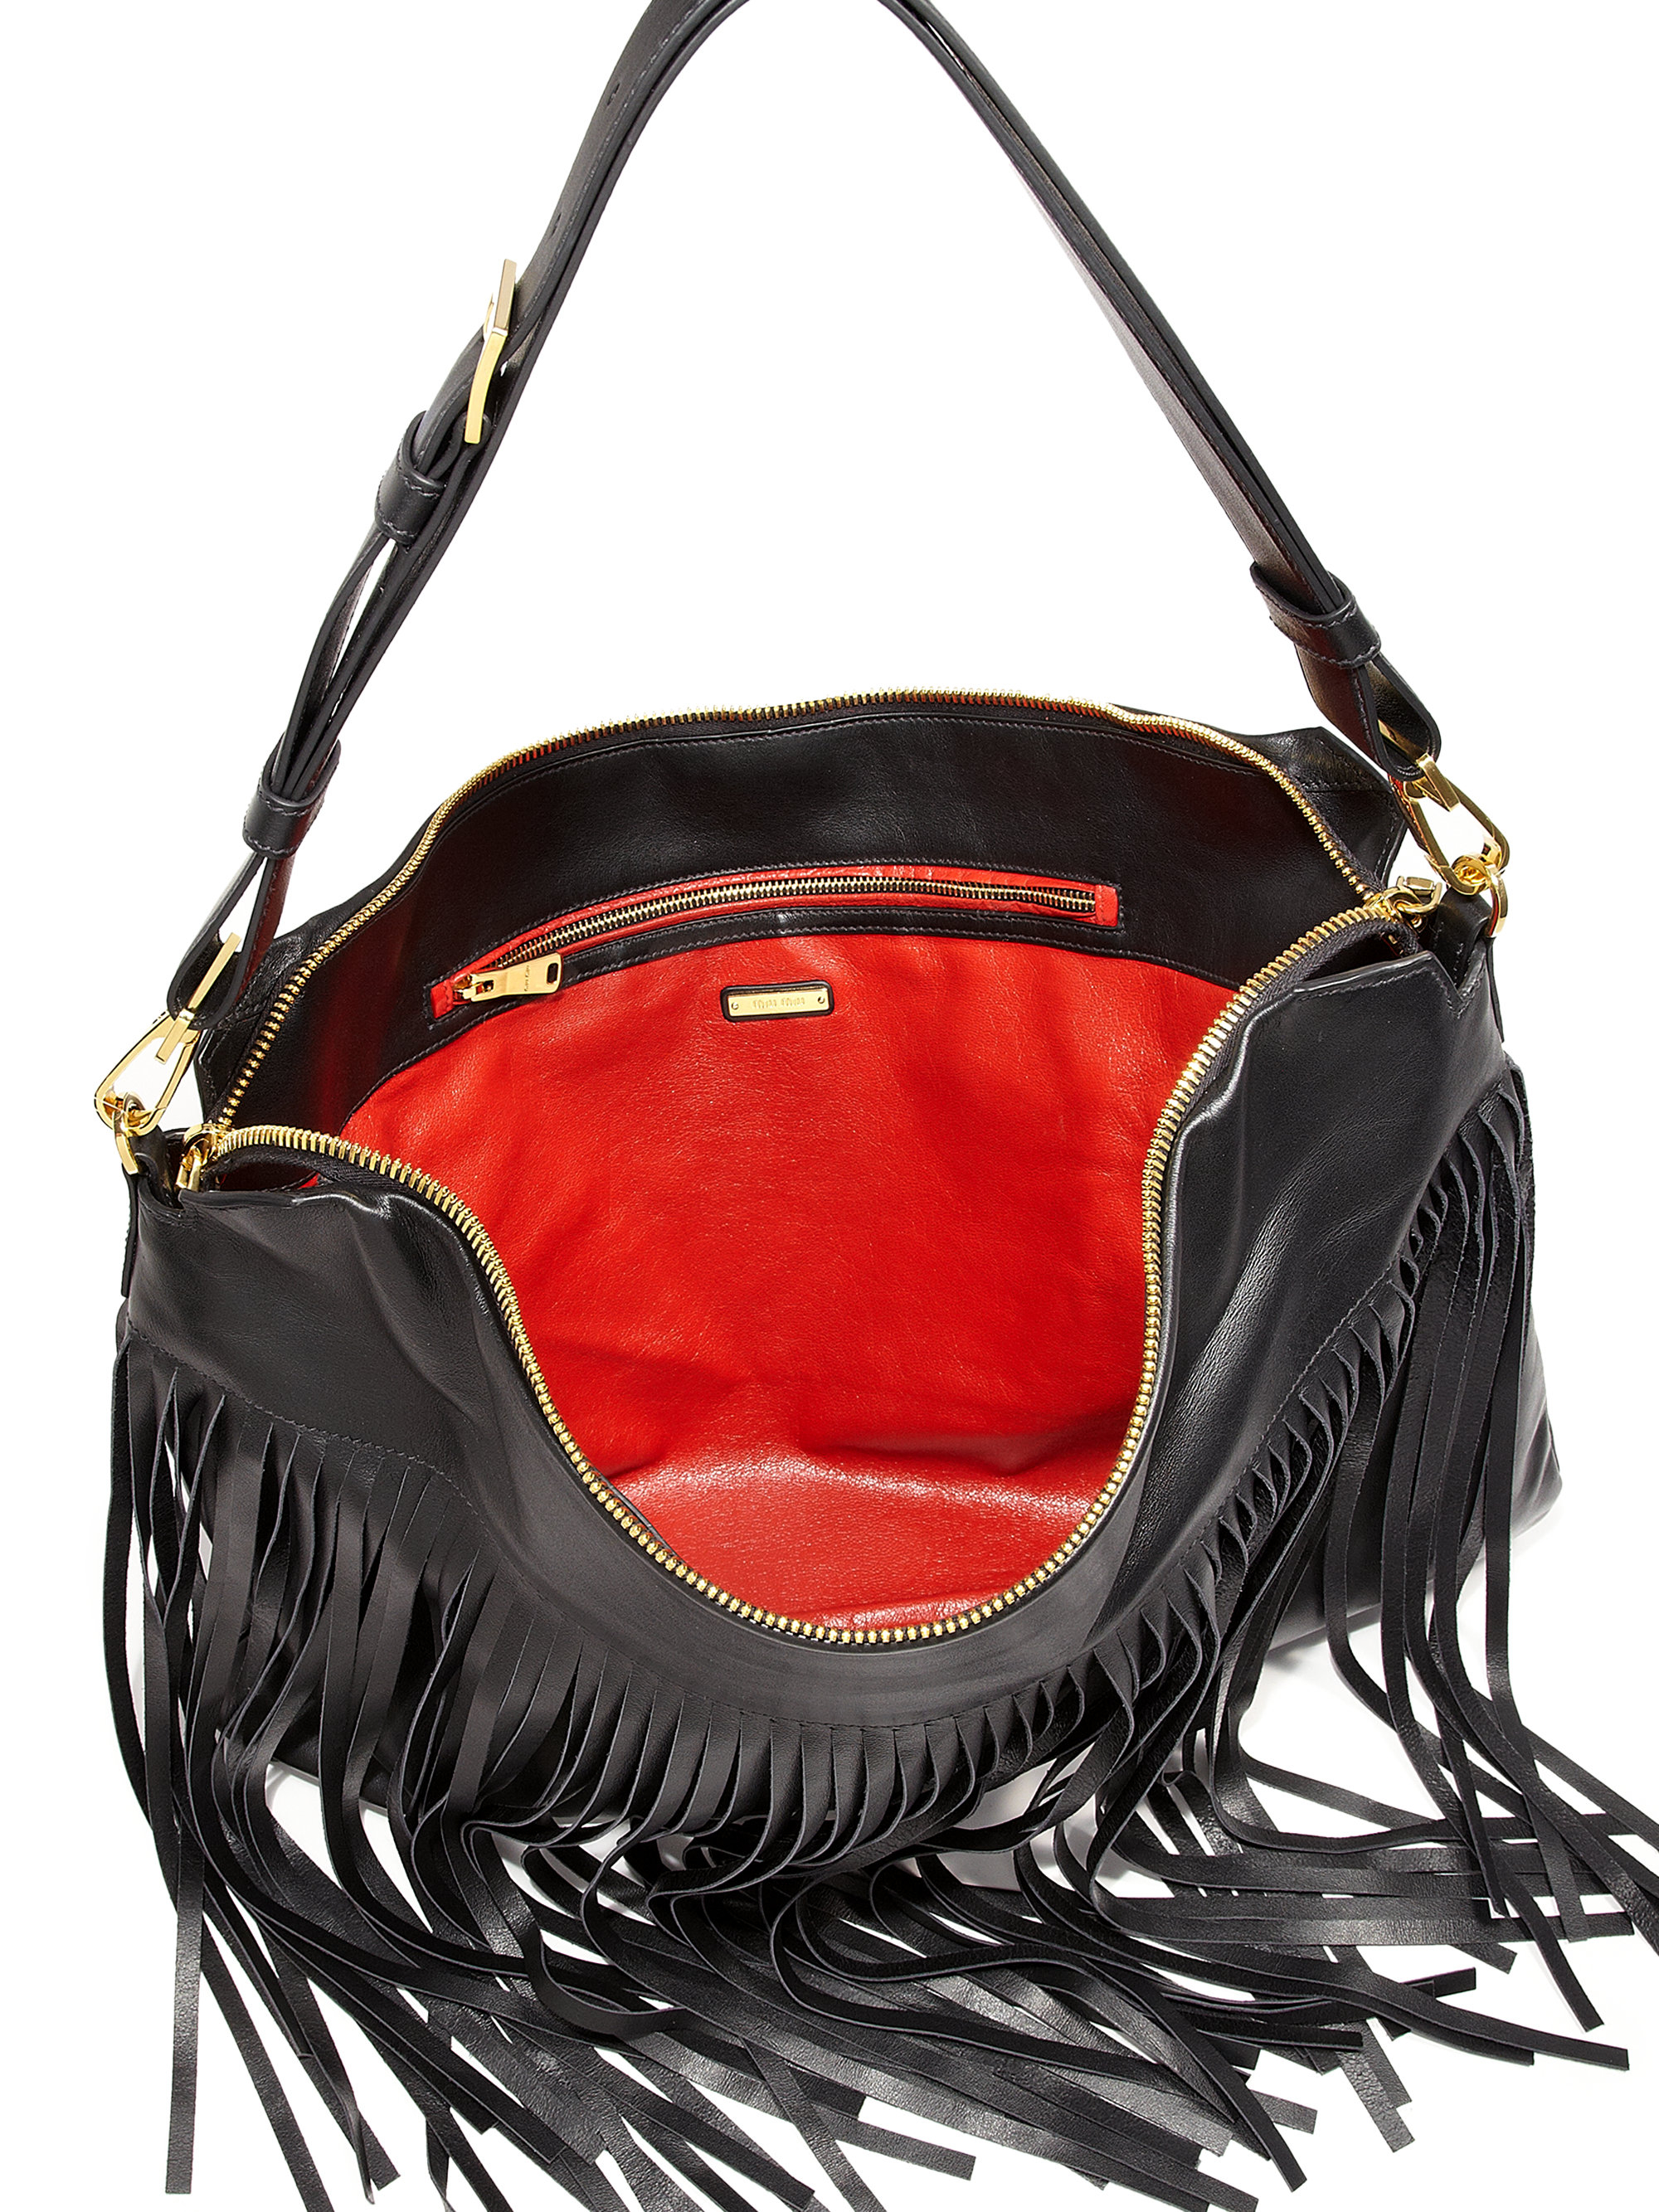 eedc5b6af6c9 miu miu outlet italy - Miu miu Fringed Hobo Bag in Black (NERO-BLACK